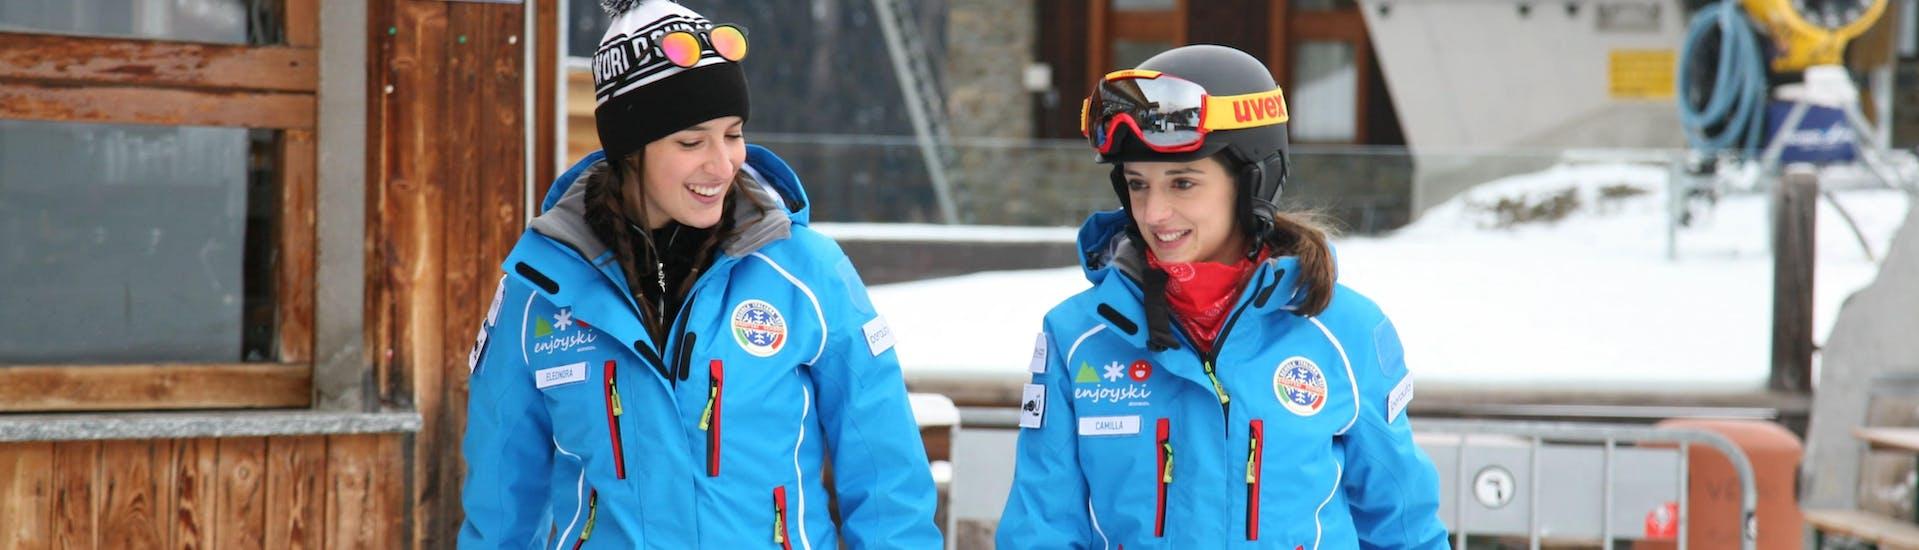 Cours de ski Adultes - Expérimentés avec Enjoyski School Valmalenco - Hero image